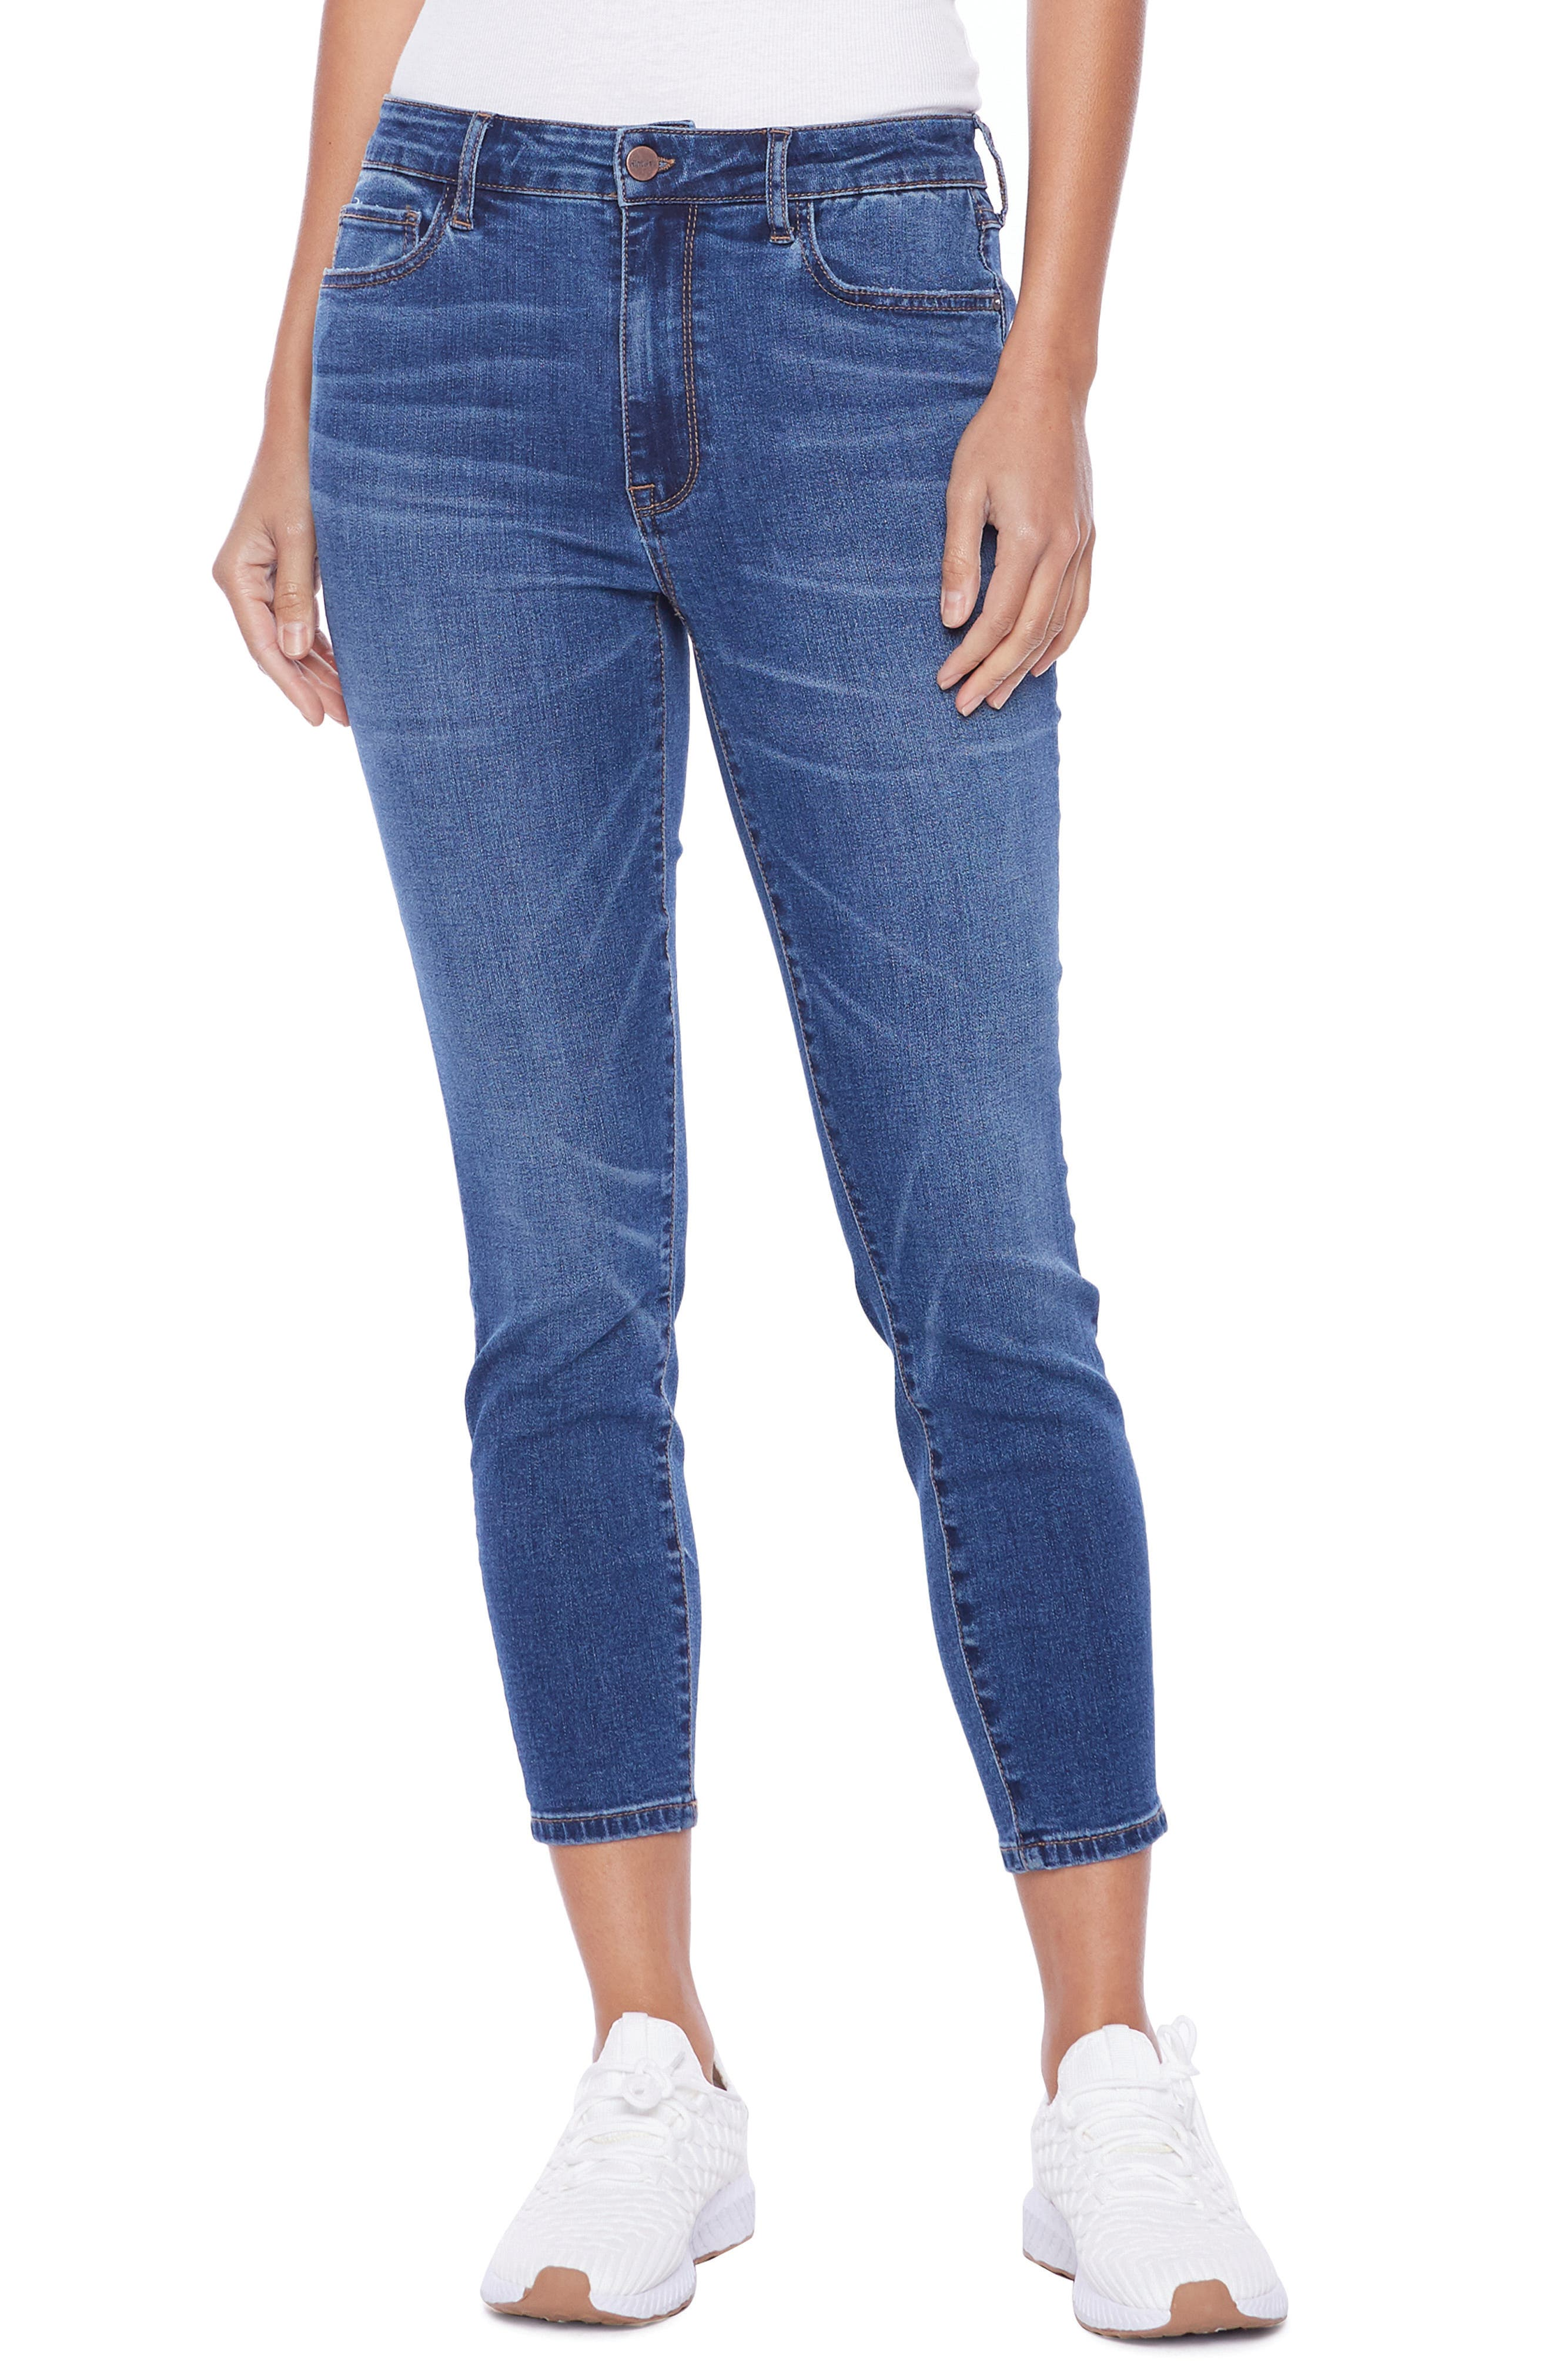 Brilliant High Waist Ankle Skinny Jeans